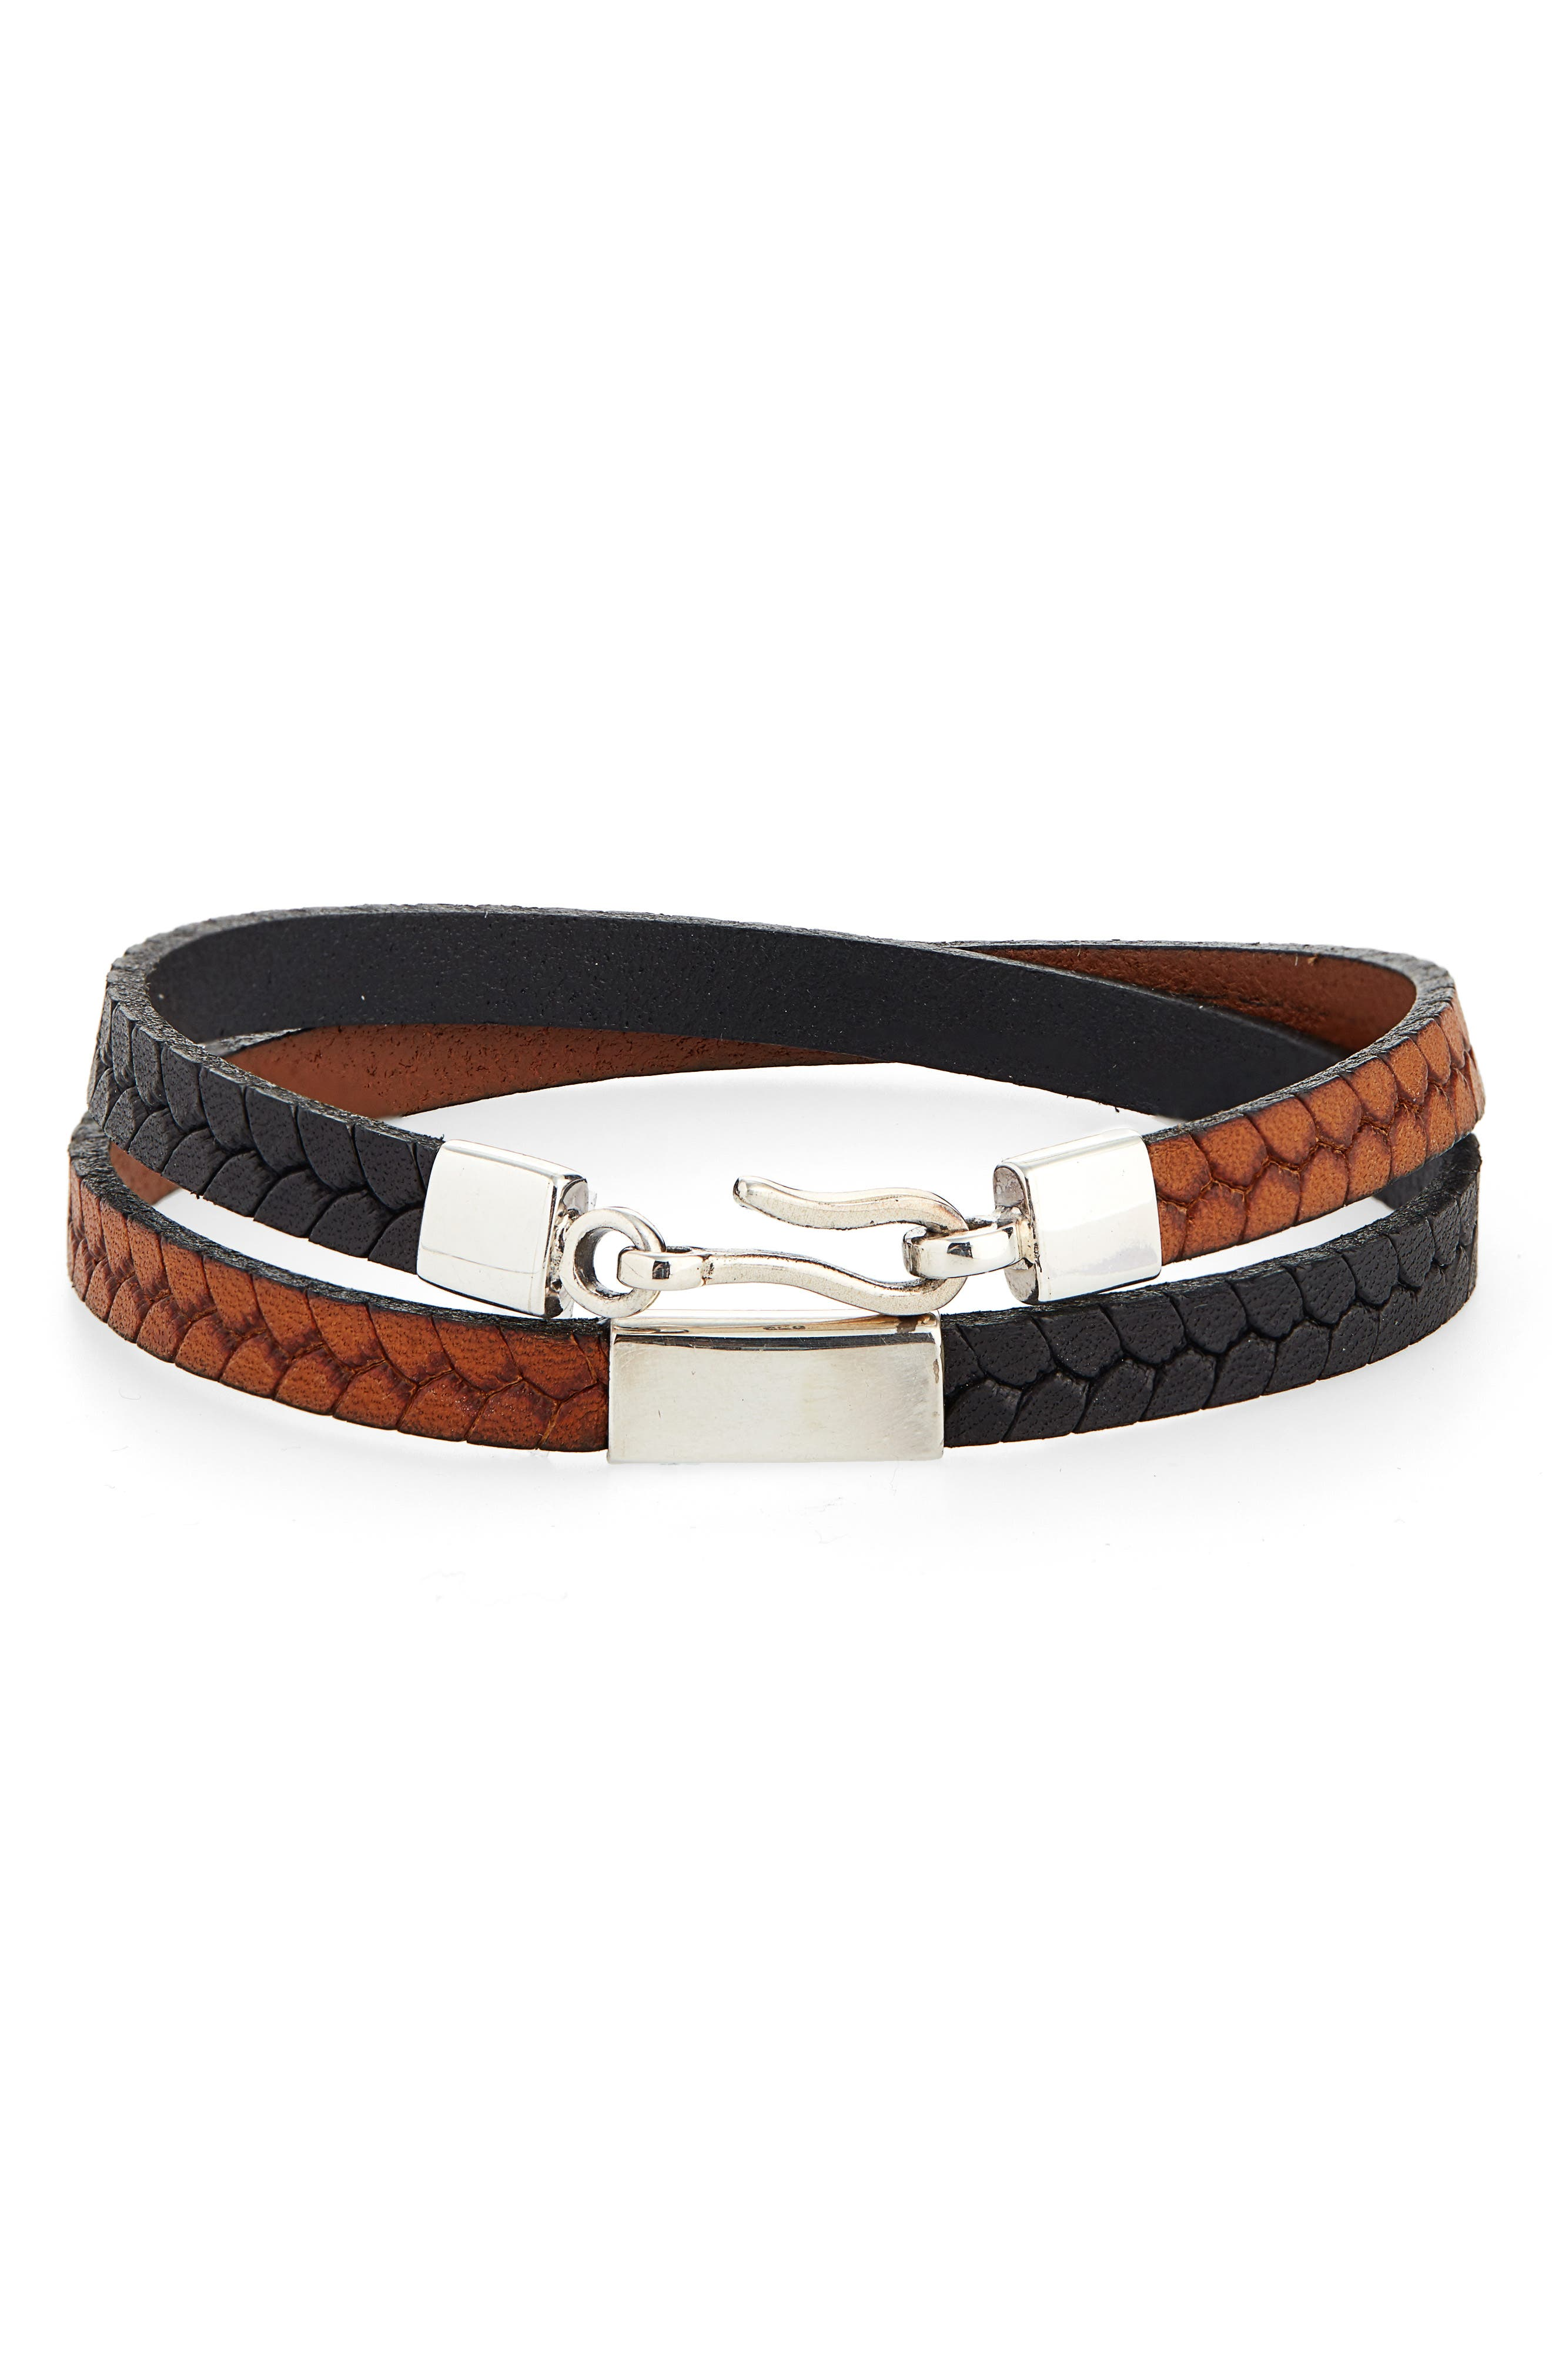 CAPUTO & CO. Embossed Leather Wrap Bracelet in Black / Tan